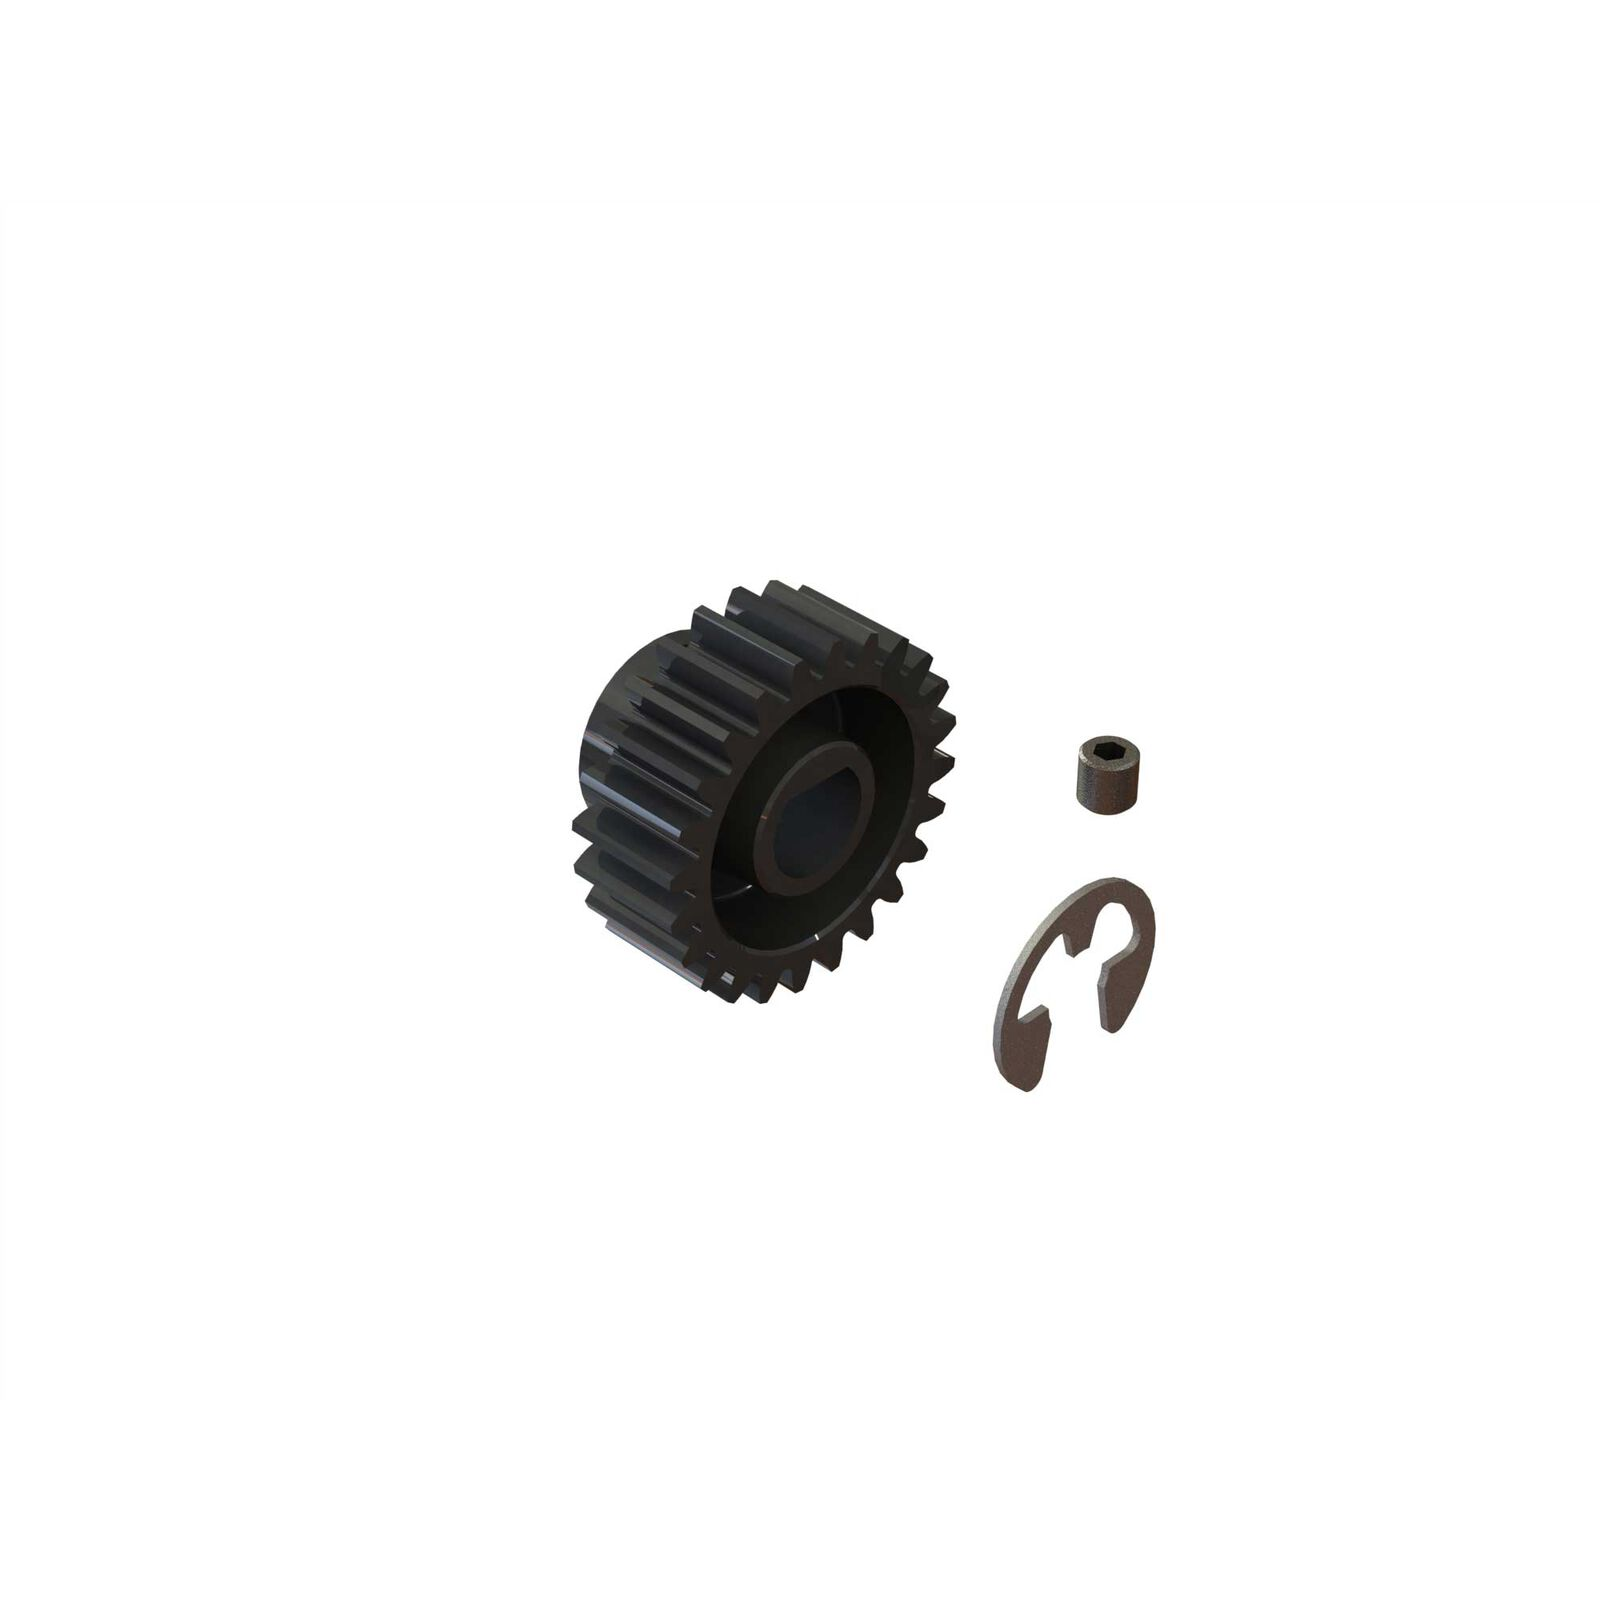 24T Mod1 Safe-D8 Pinion Gear